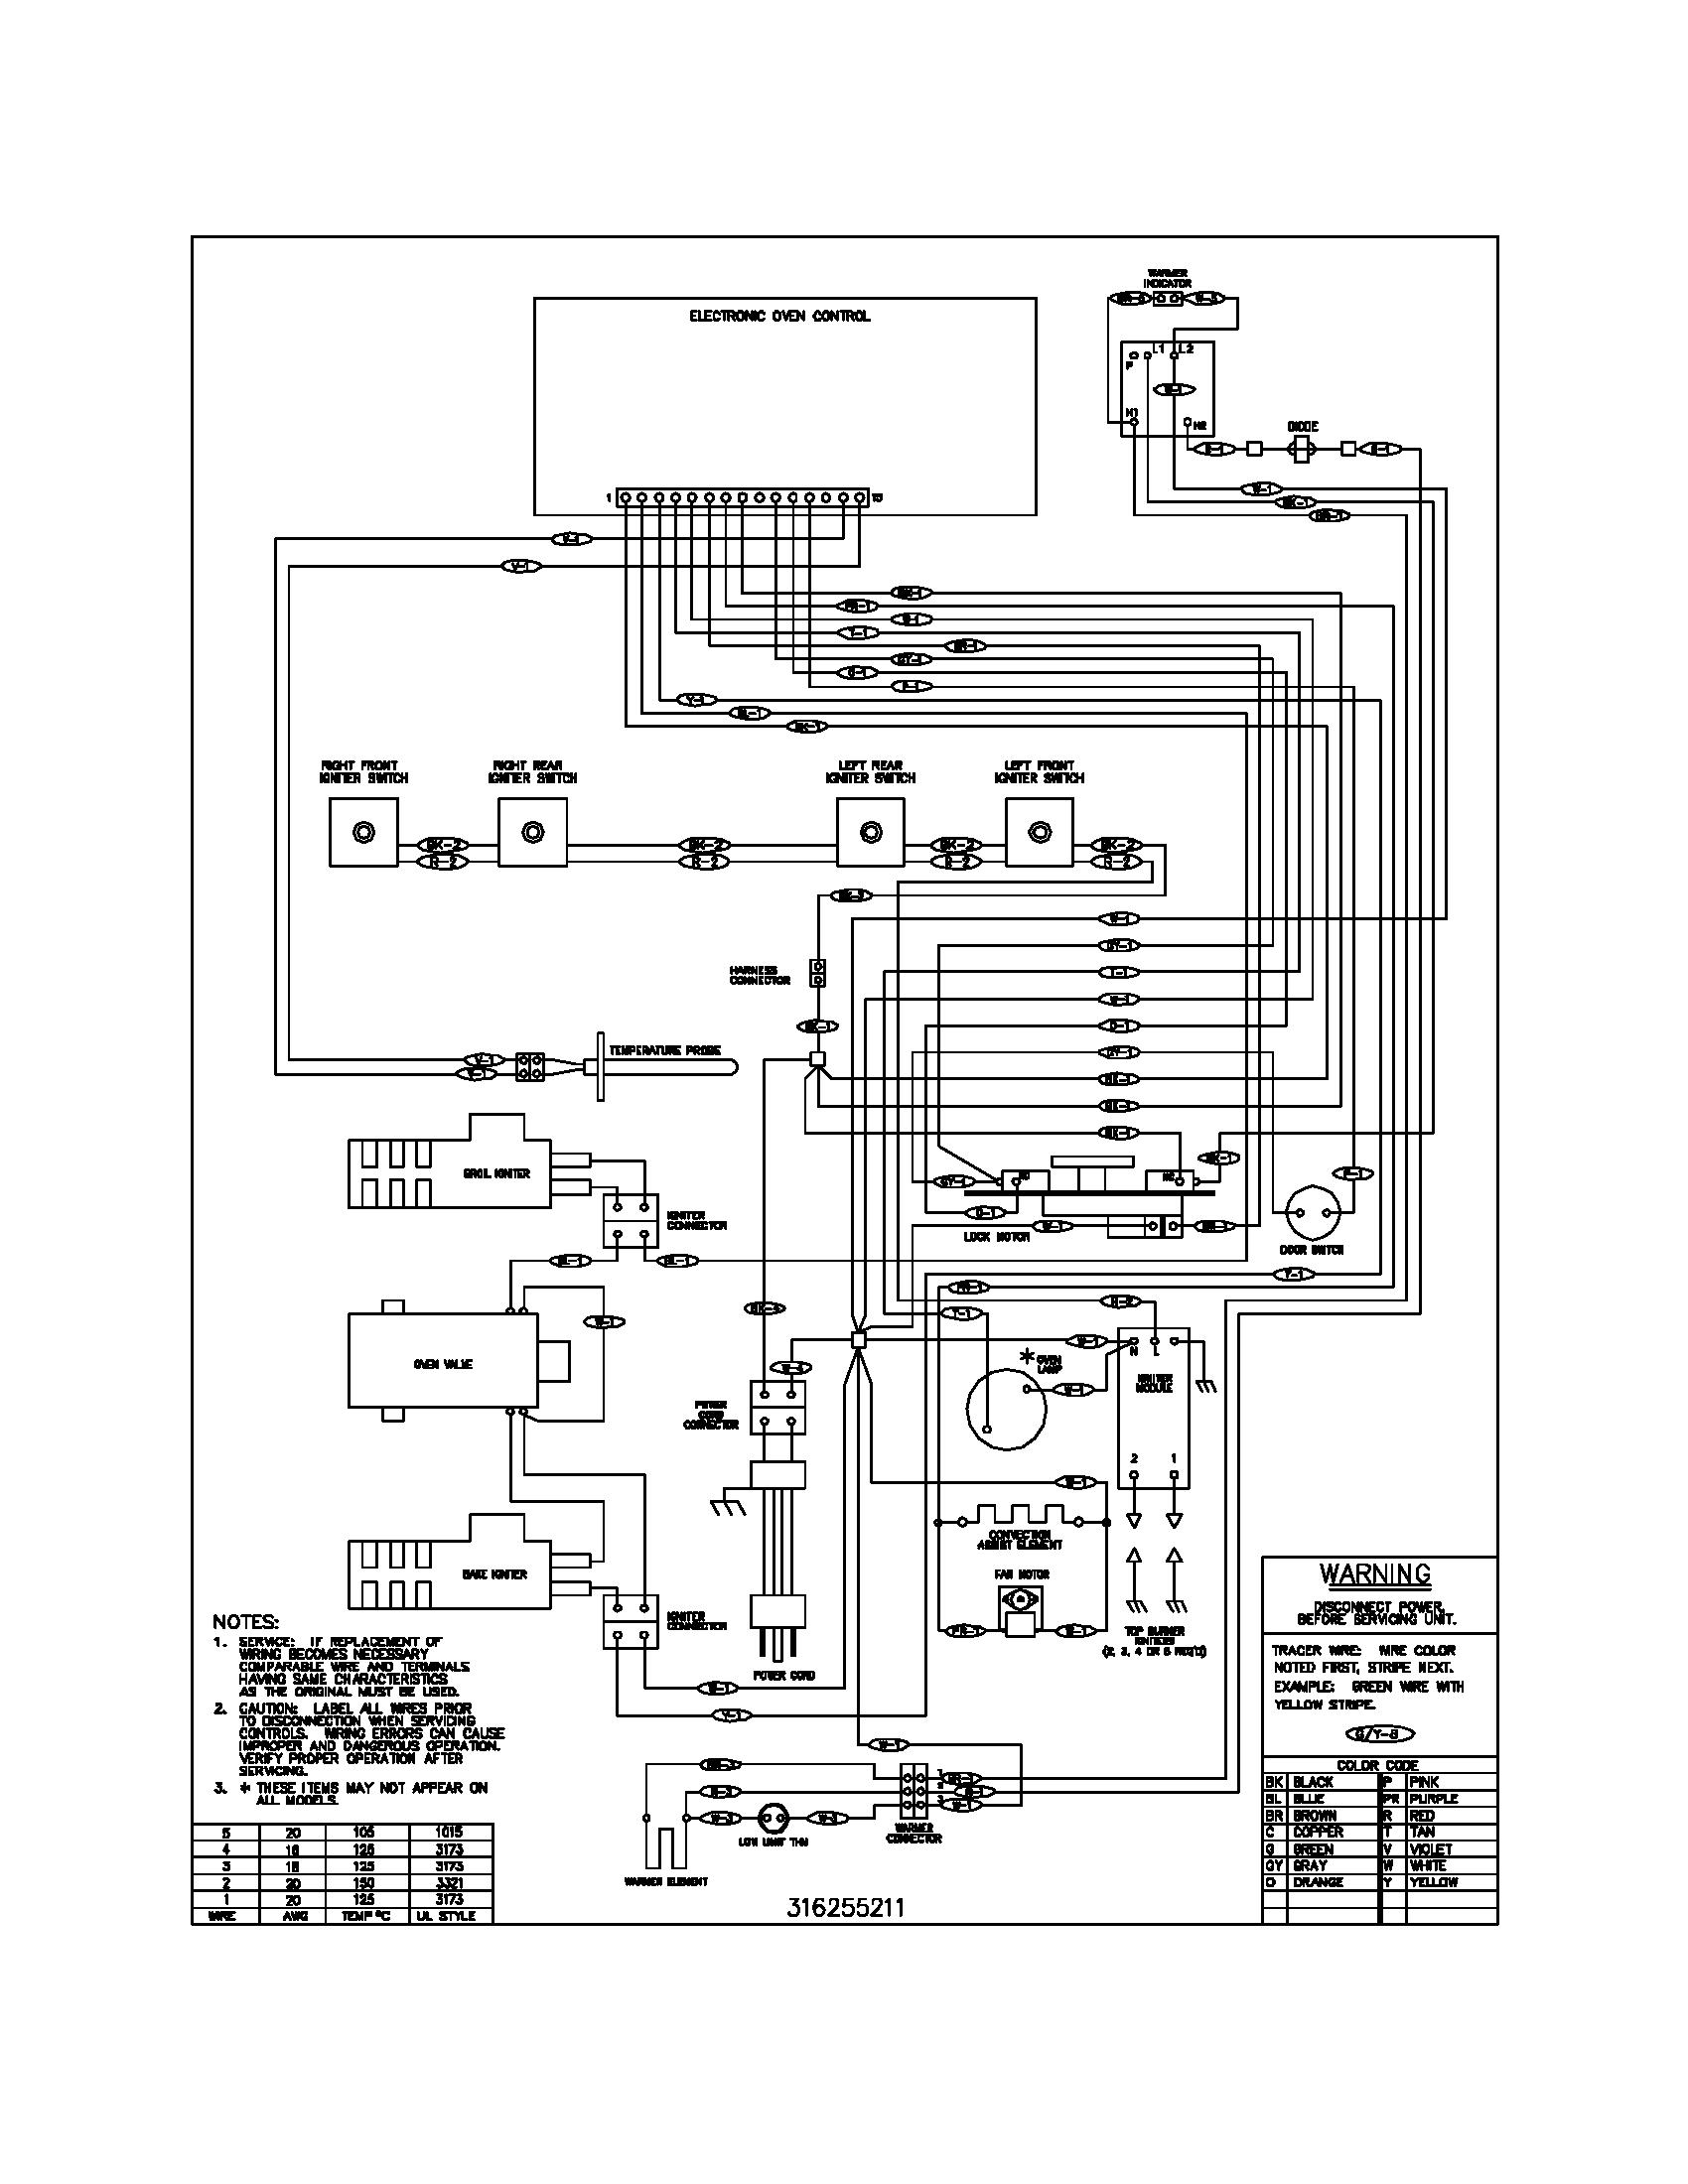 Cushman Wiring Diagram Diagrams Electric Wire Hustle Hawk User Manuals Parts Manuals25forcollegecom